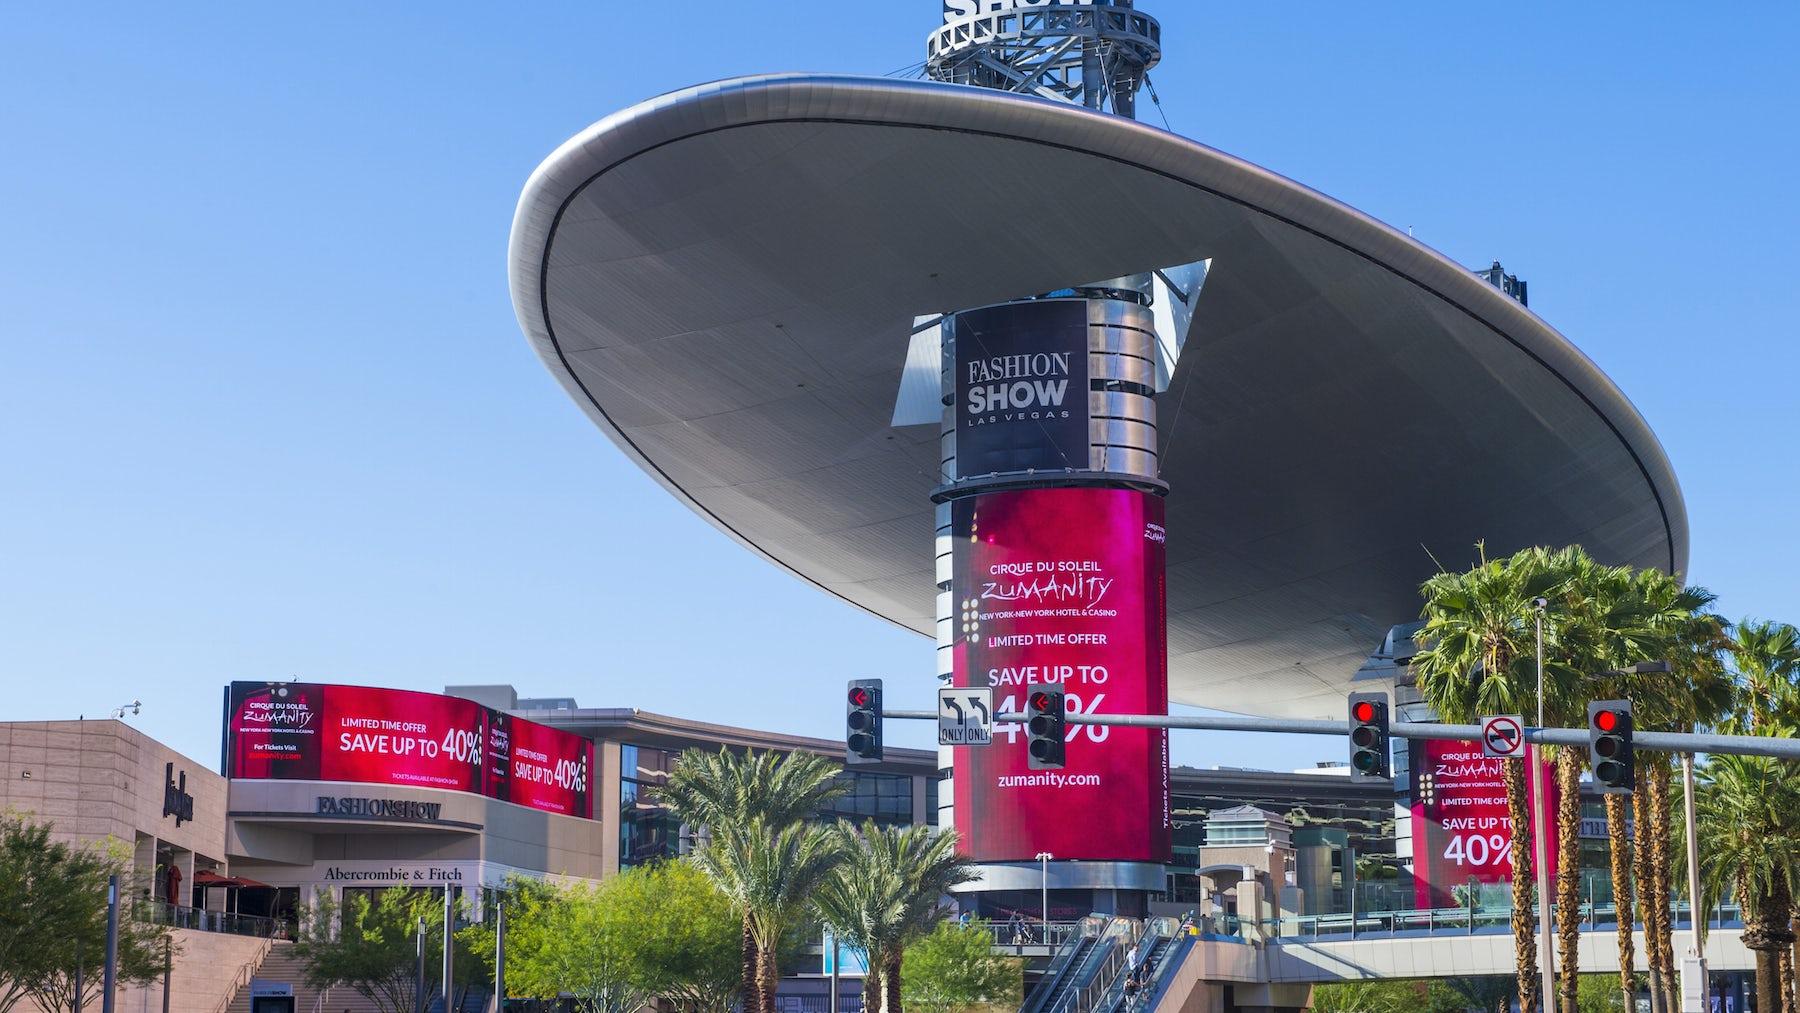 Fashion Show Mall, Las Vegas   Source: Shutterstock